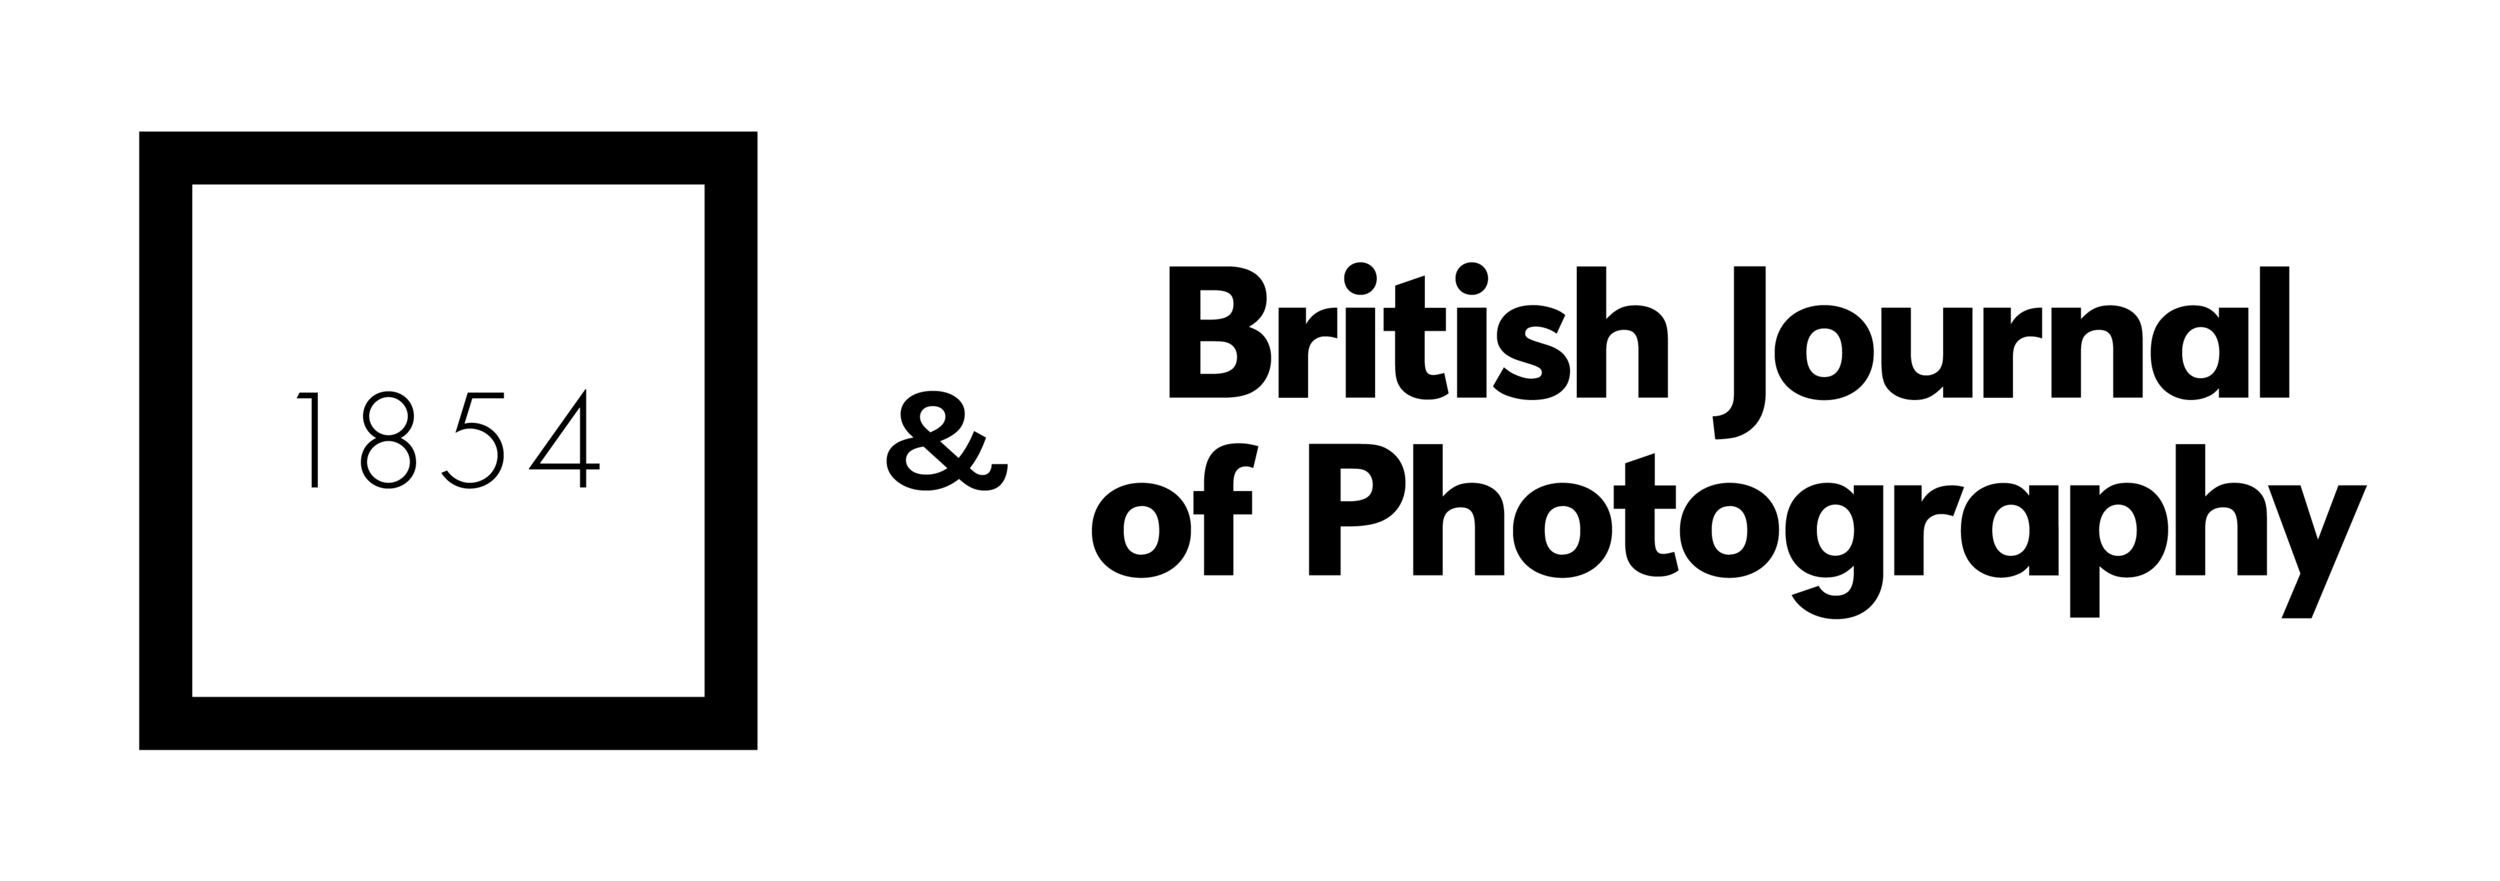 1854 & BJP Black Logo.png